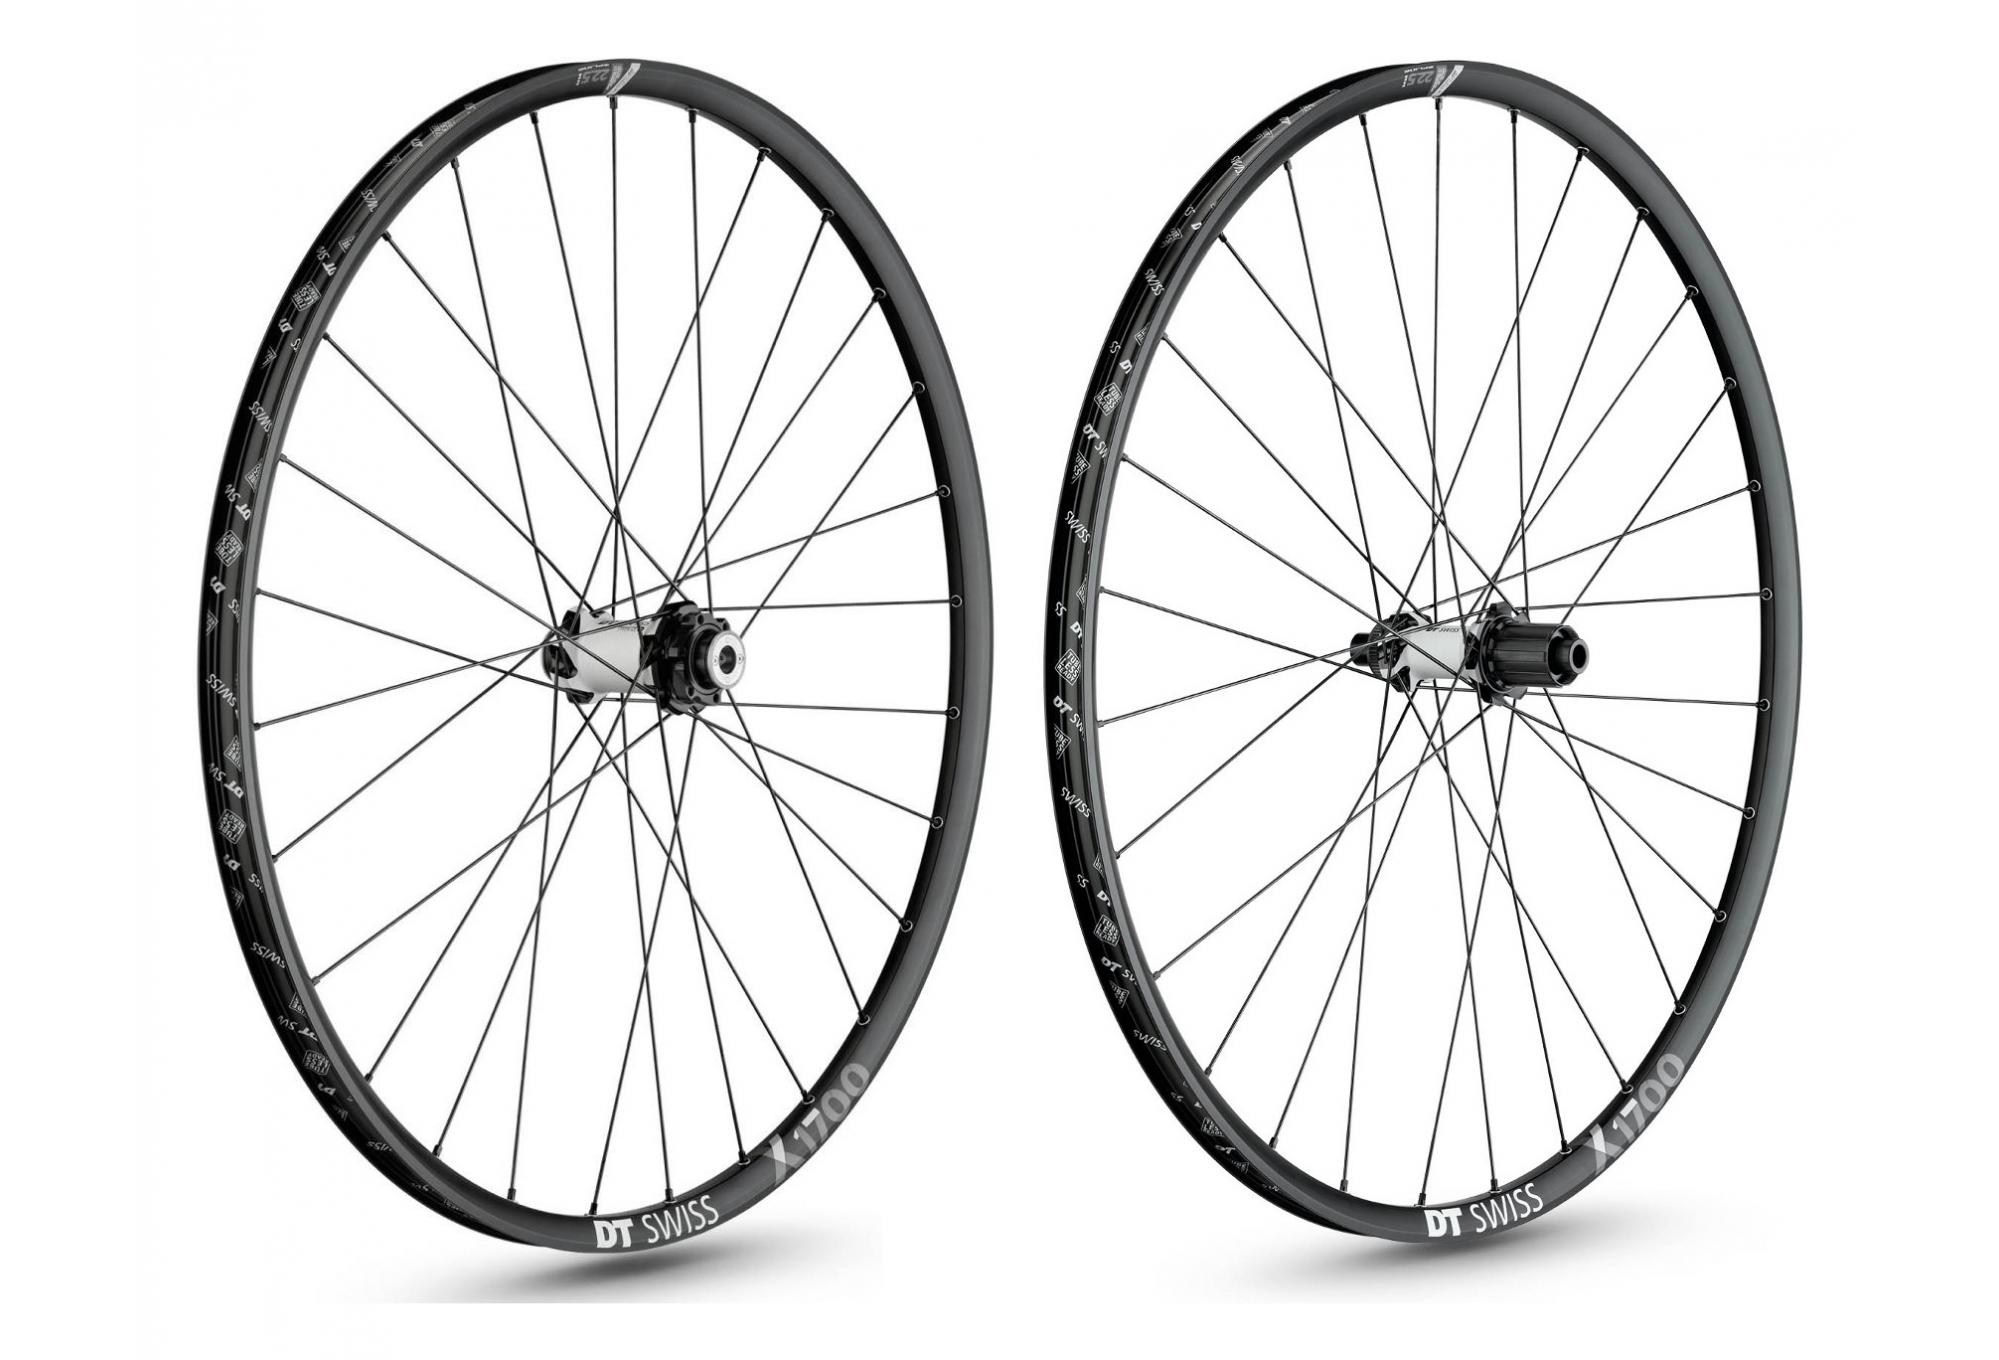 Pair of Wheels MTB DT Swiss X1700 Spline 25 27 5'' | RS-1 Predictive  Stering | 12x142mm | Corps Sram XD 2019